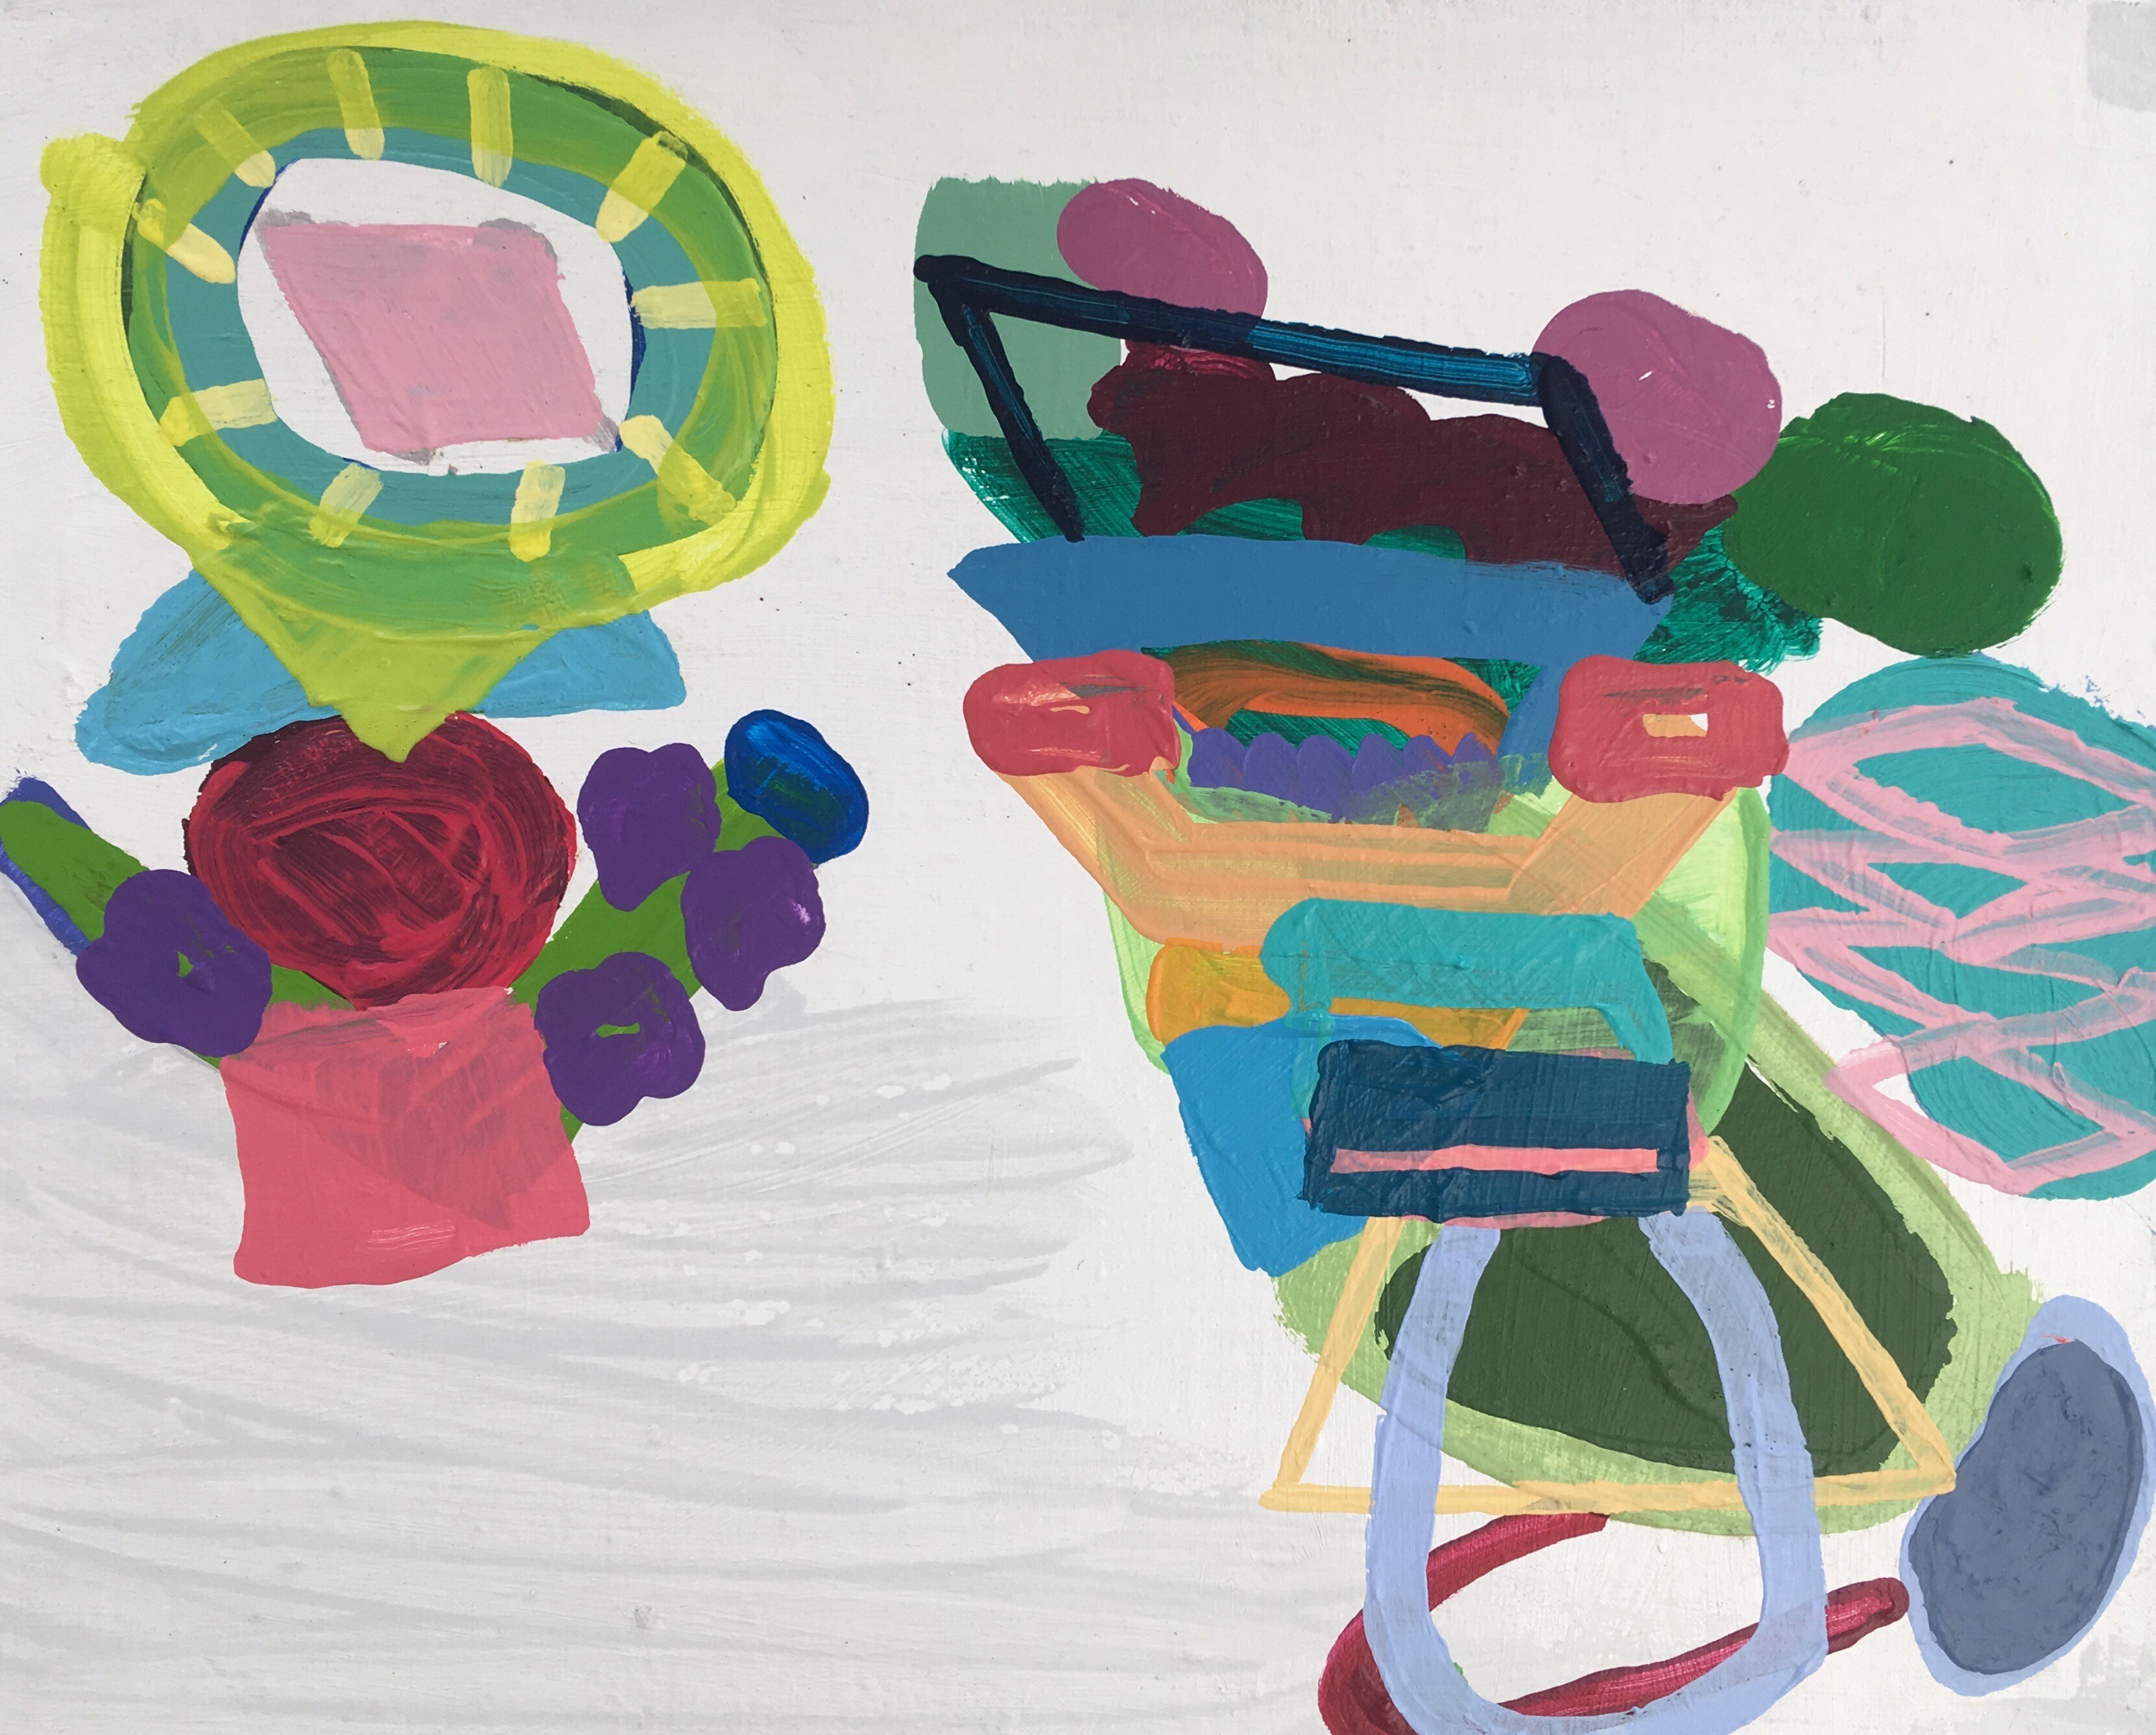 série branca pintura . Maria Lynch. 41 x 32 cm